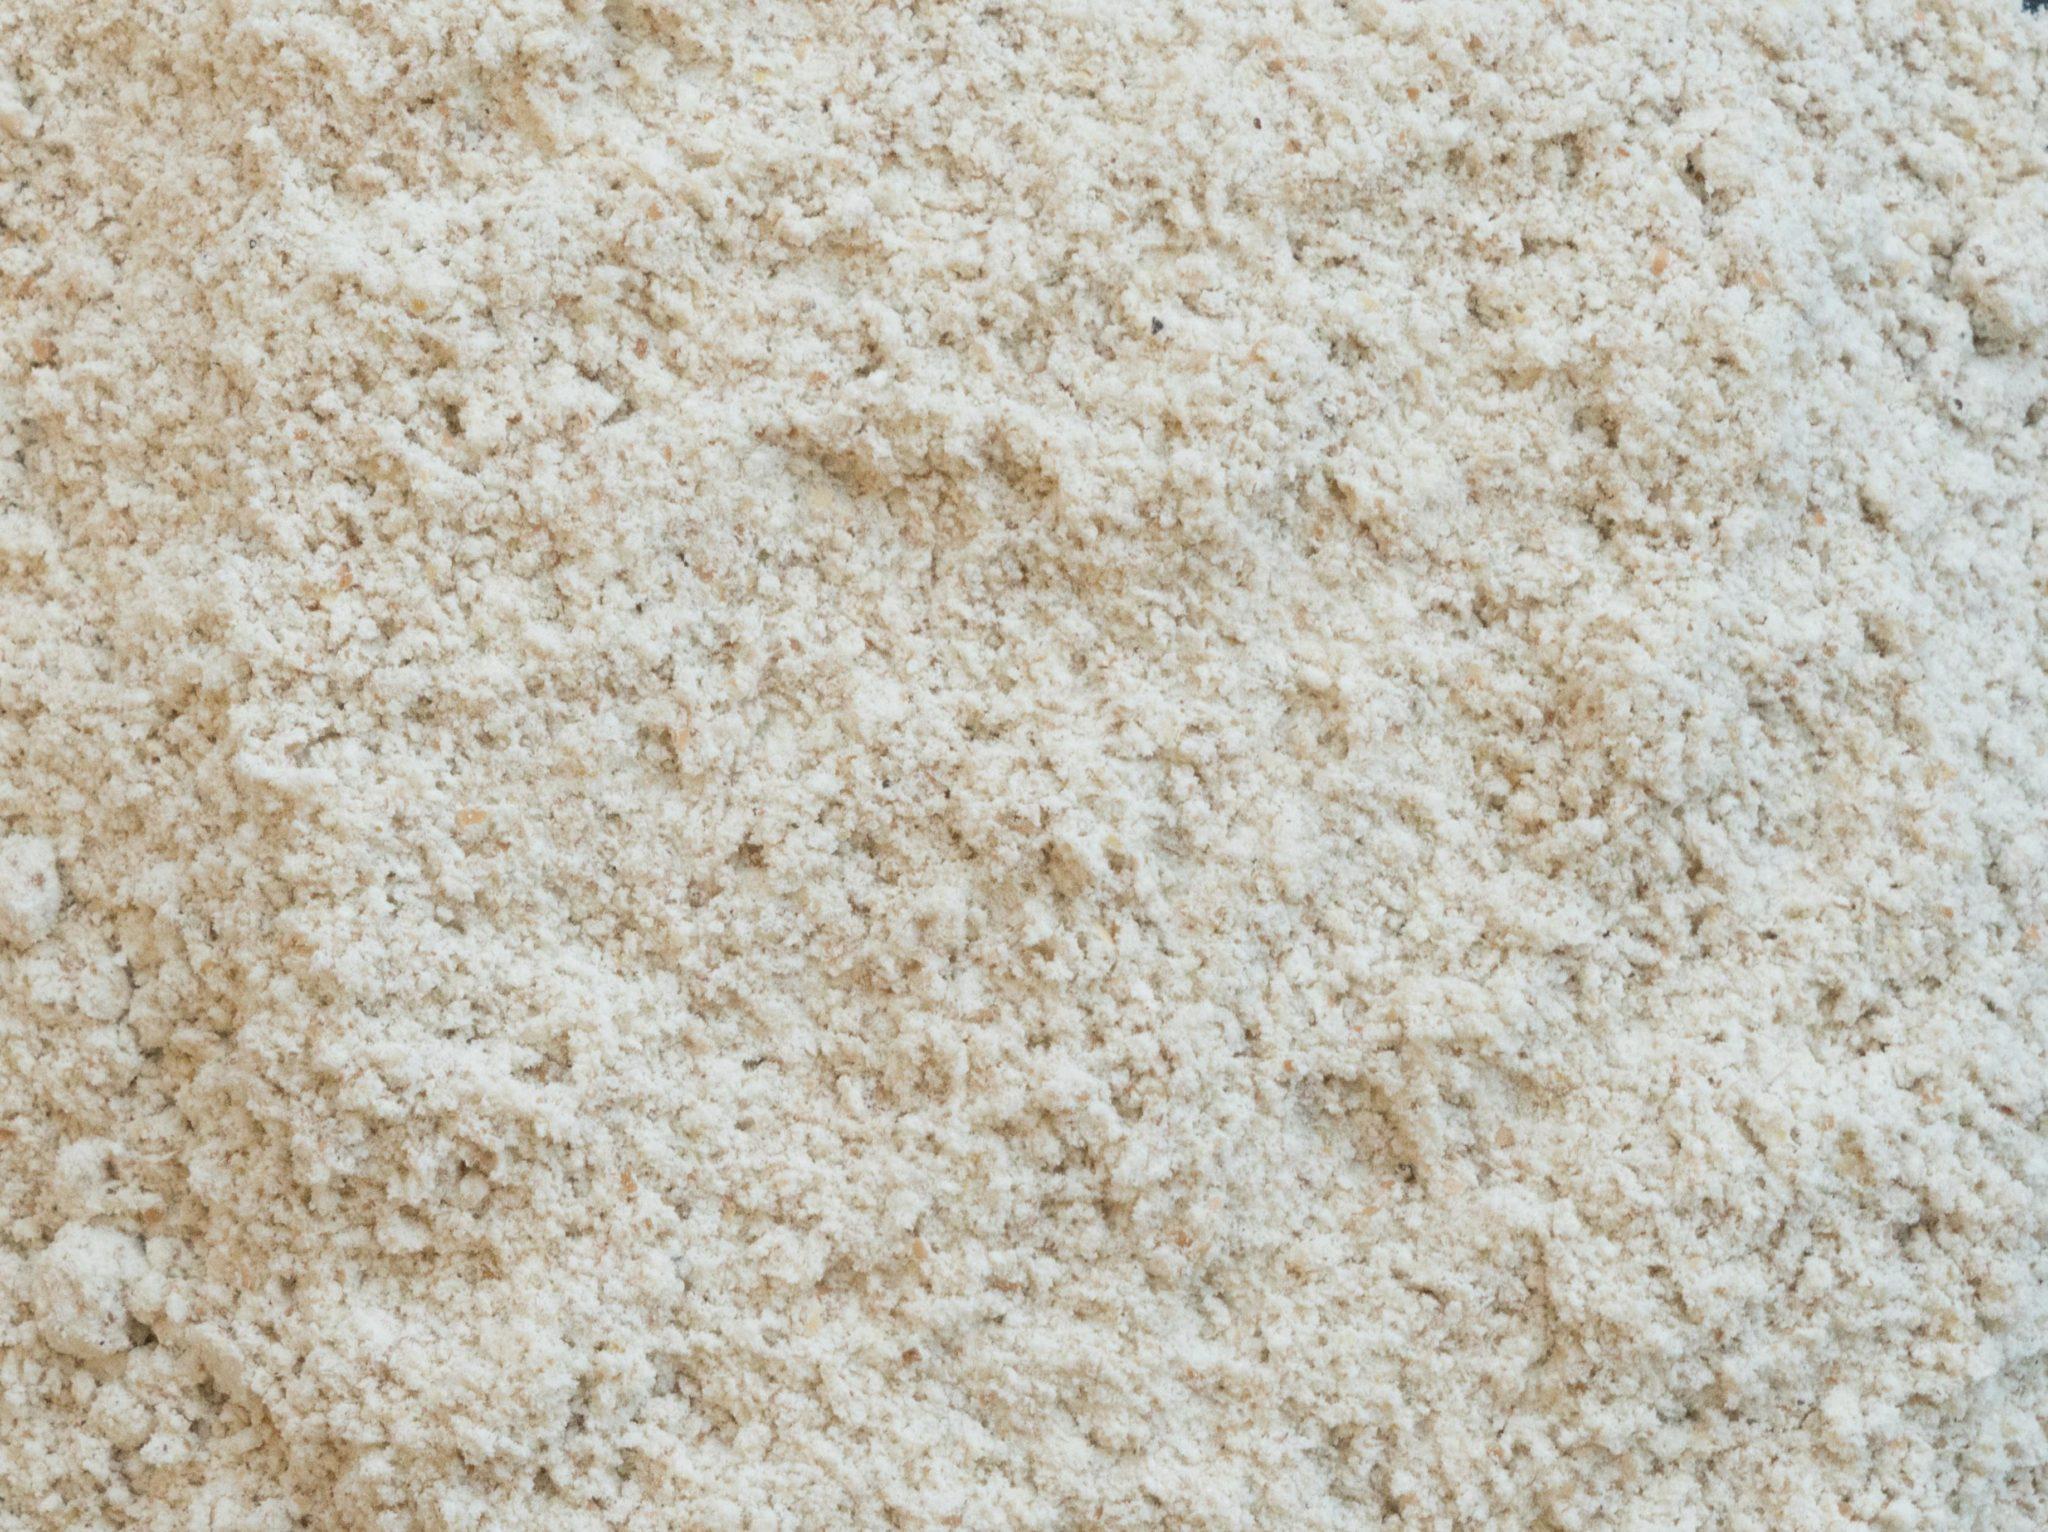 Organic Six Grain Flour